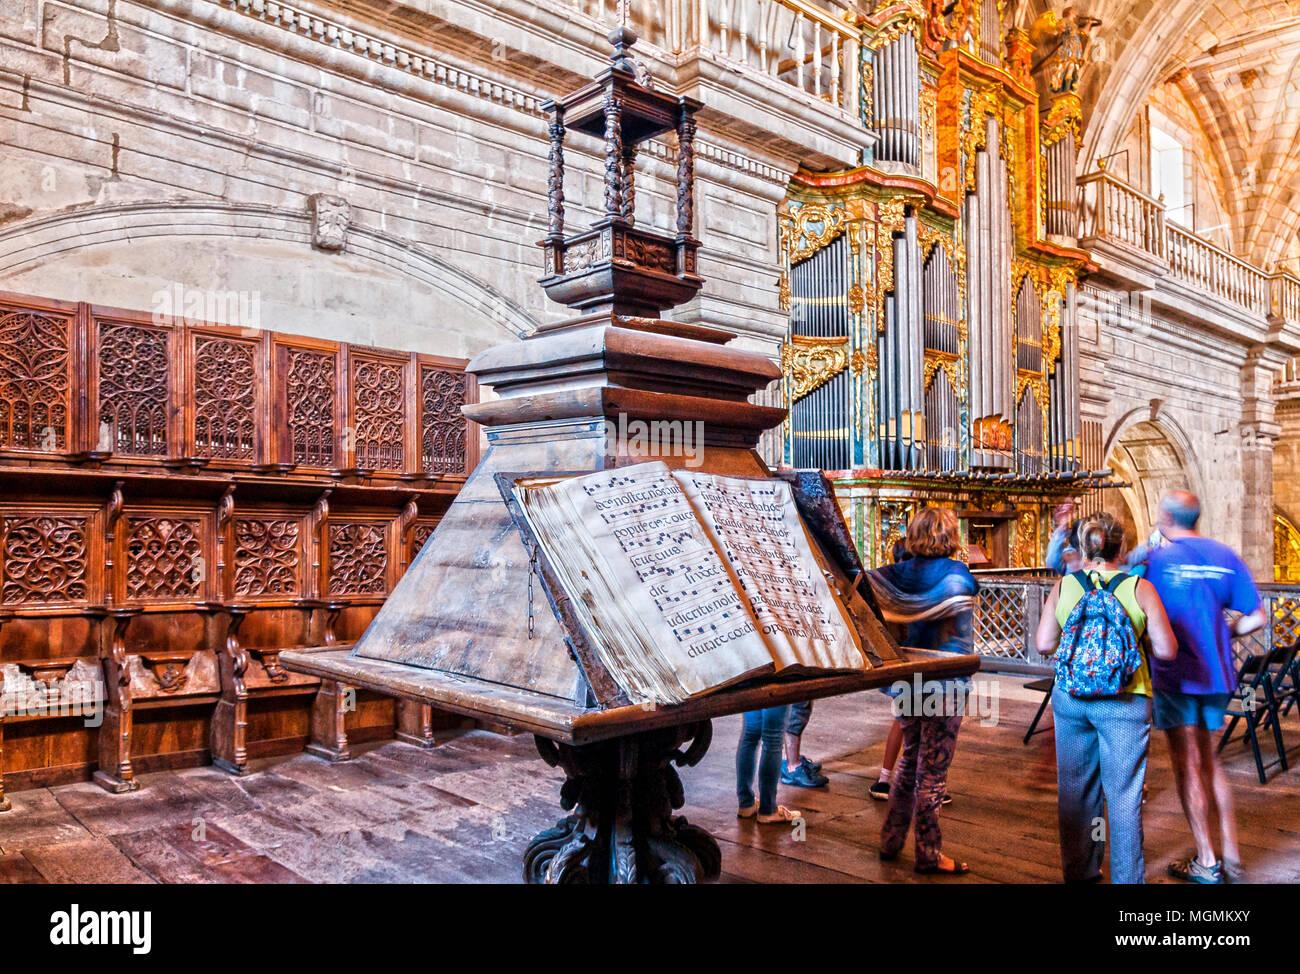 Facistol y órgano del Monasterio de San Salvador. De Celanova. Ourense. Galicia. España Imagen De Stock